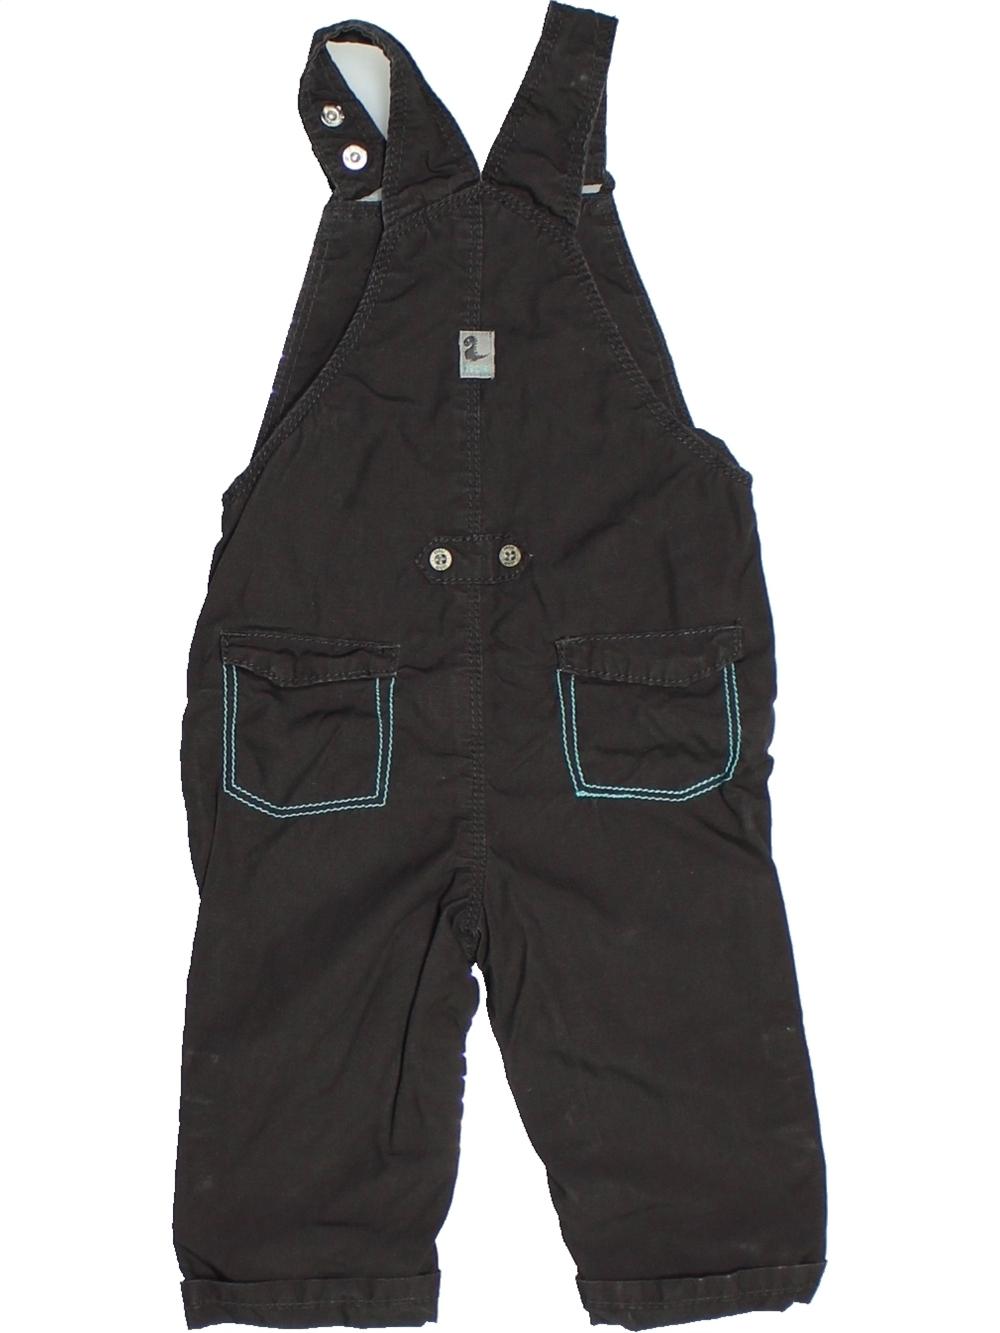 Salopette-bebe-garcon-OKAIDI-9-mois-noir-hiver-vetement-bebe-1099611